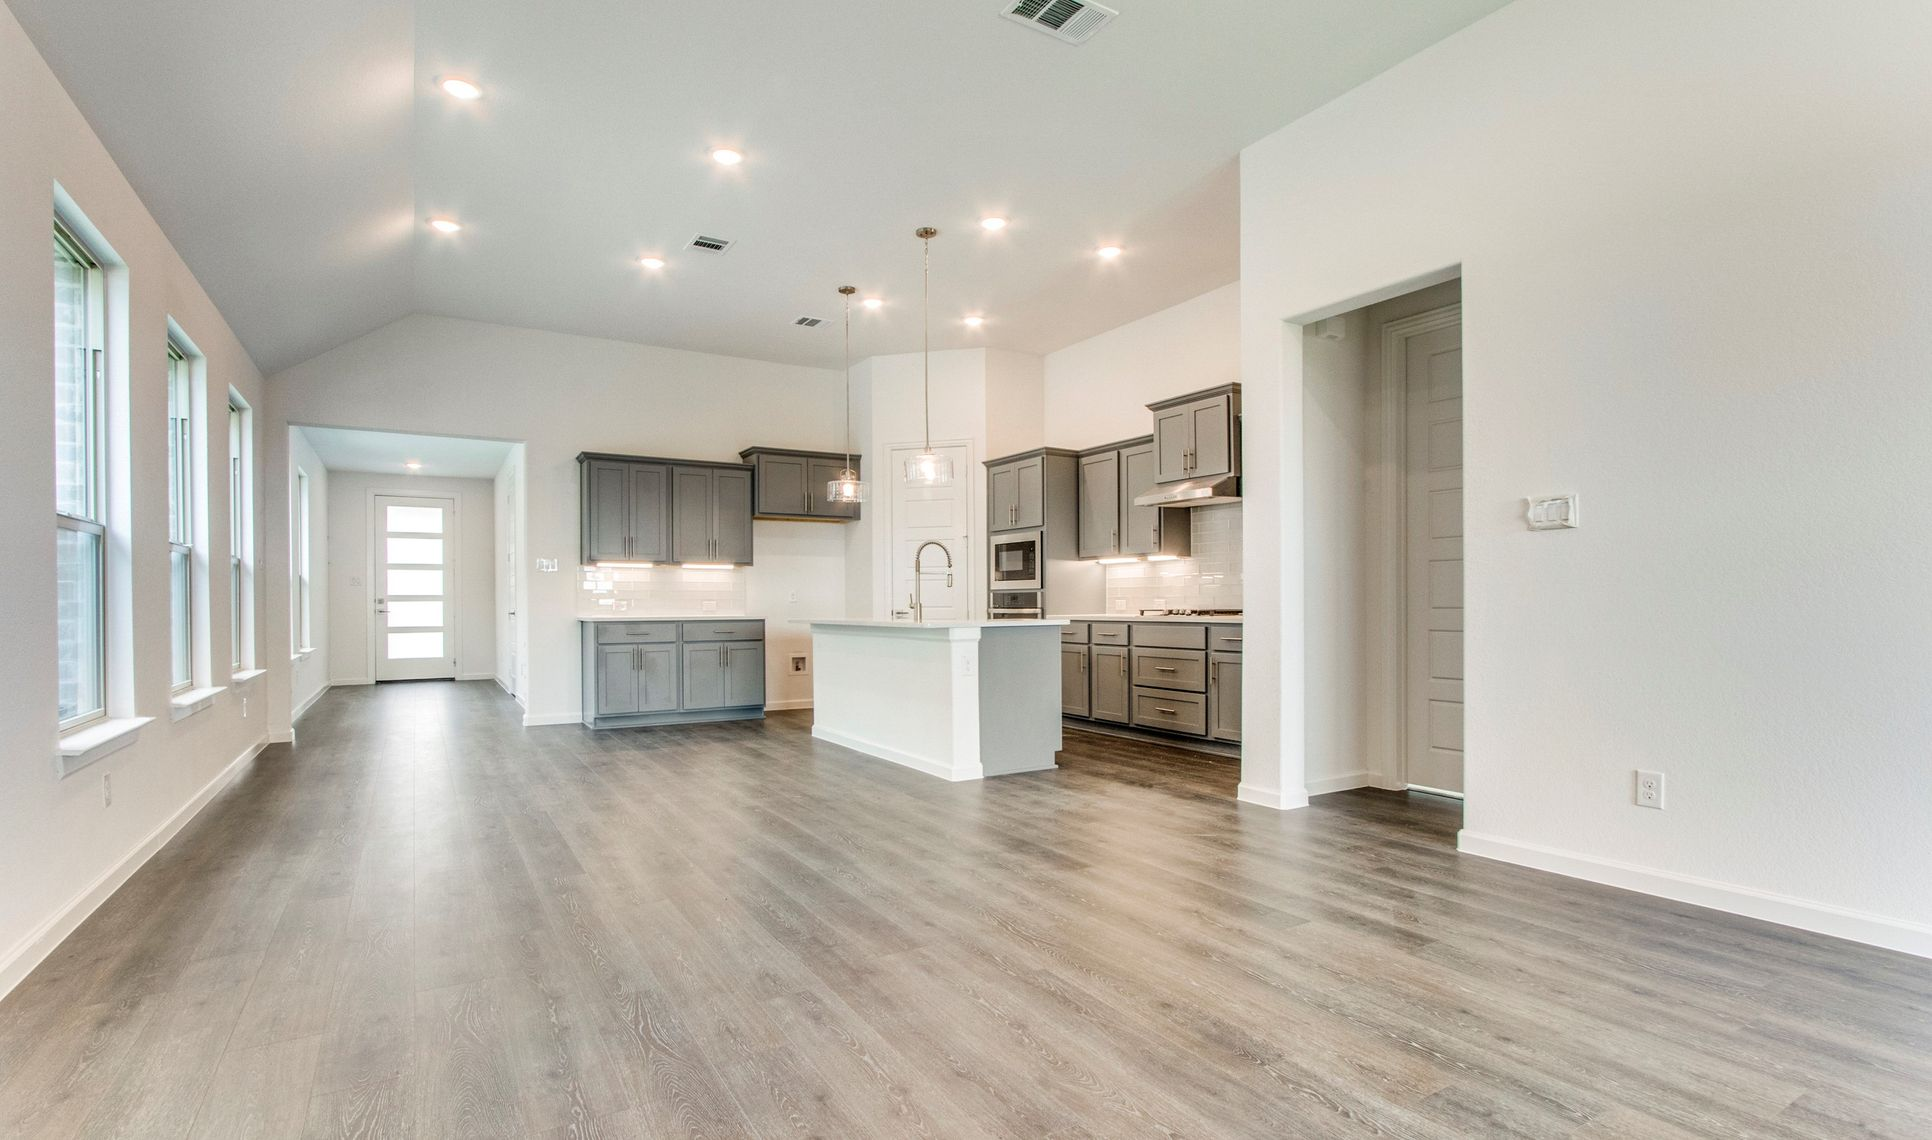 Interior:Ideal floorplan for entertaining